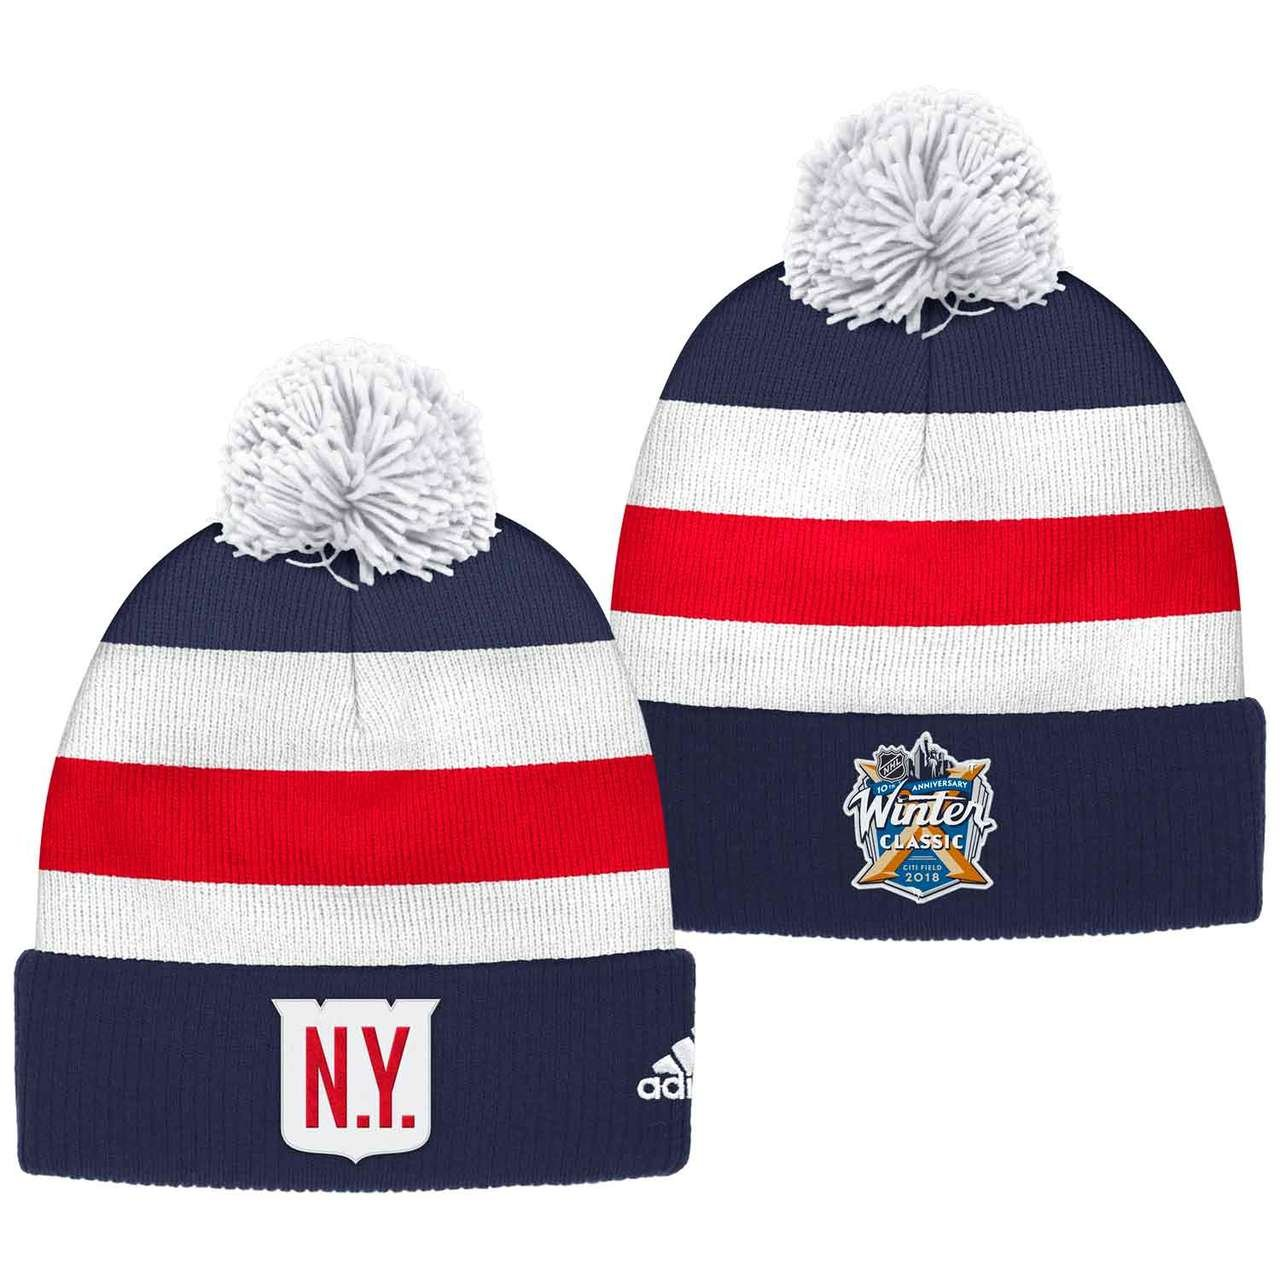 on sale 0e86c 08523 Amazon.com   New York Rangers 2018 Winter Classic Cuffed Pom Knit Players  Adidas Hat   Clothing